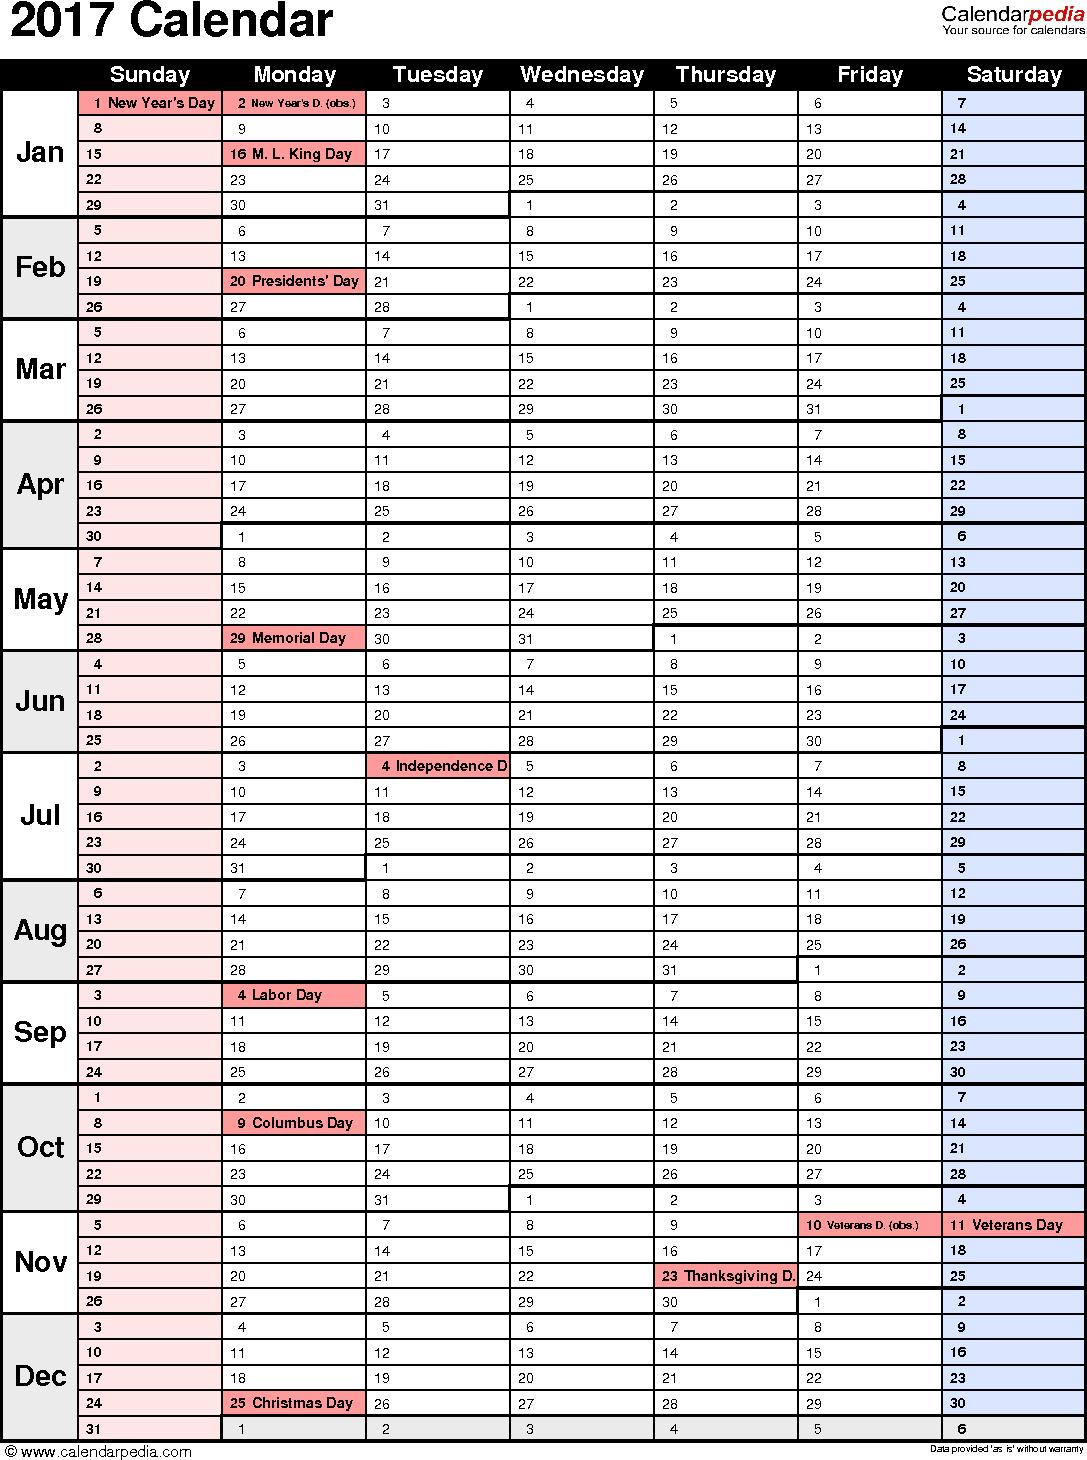 Document Of 2017 Calendar Template Excel Inside 2017 Calendar Template Excel Free Download